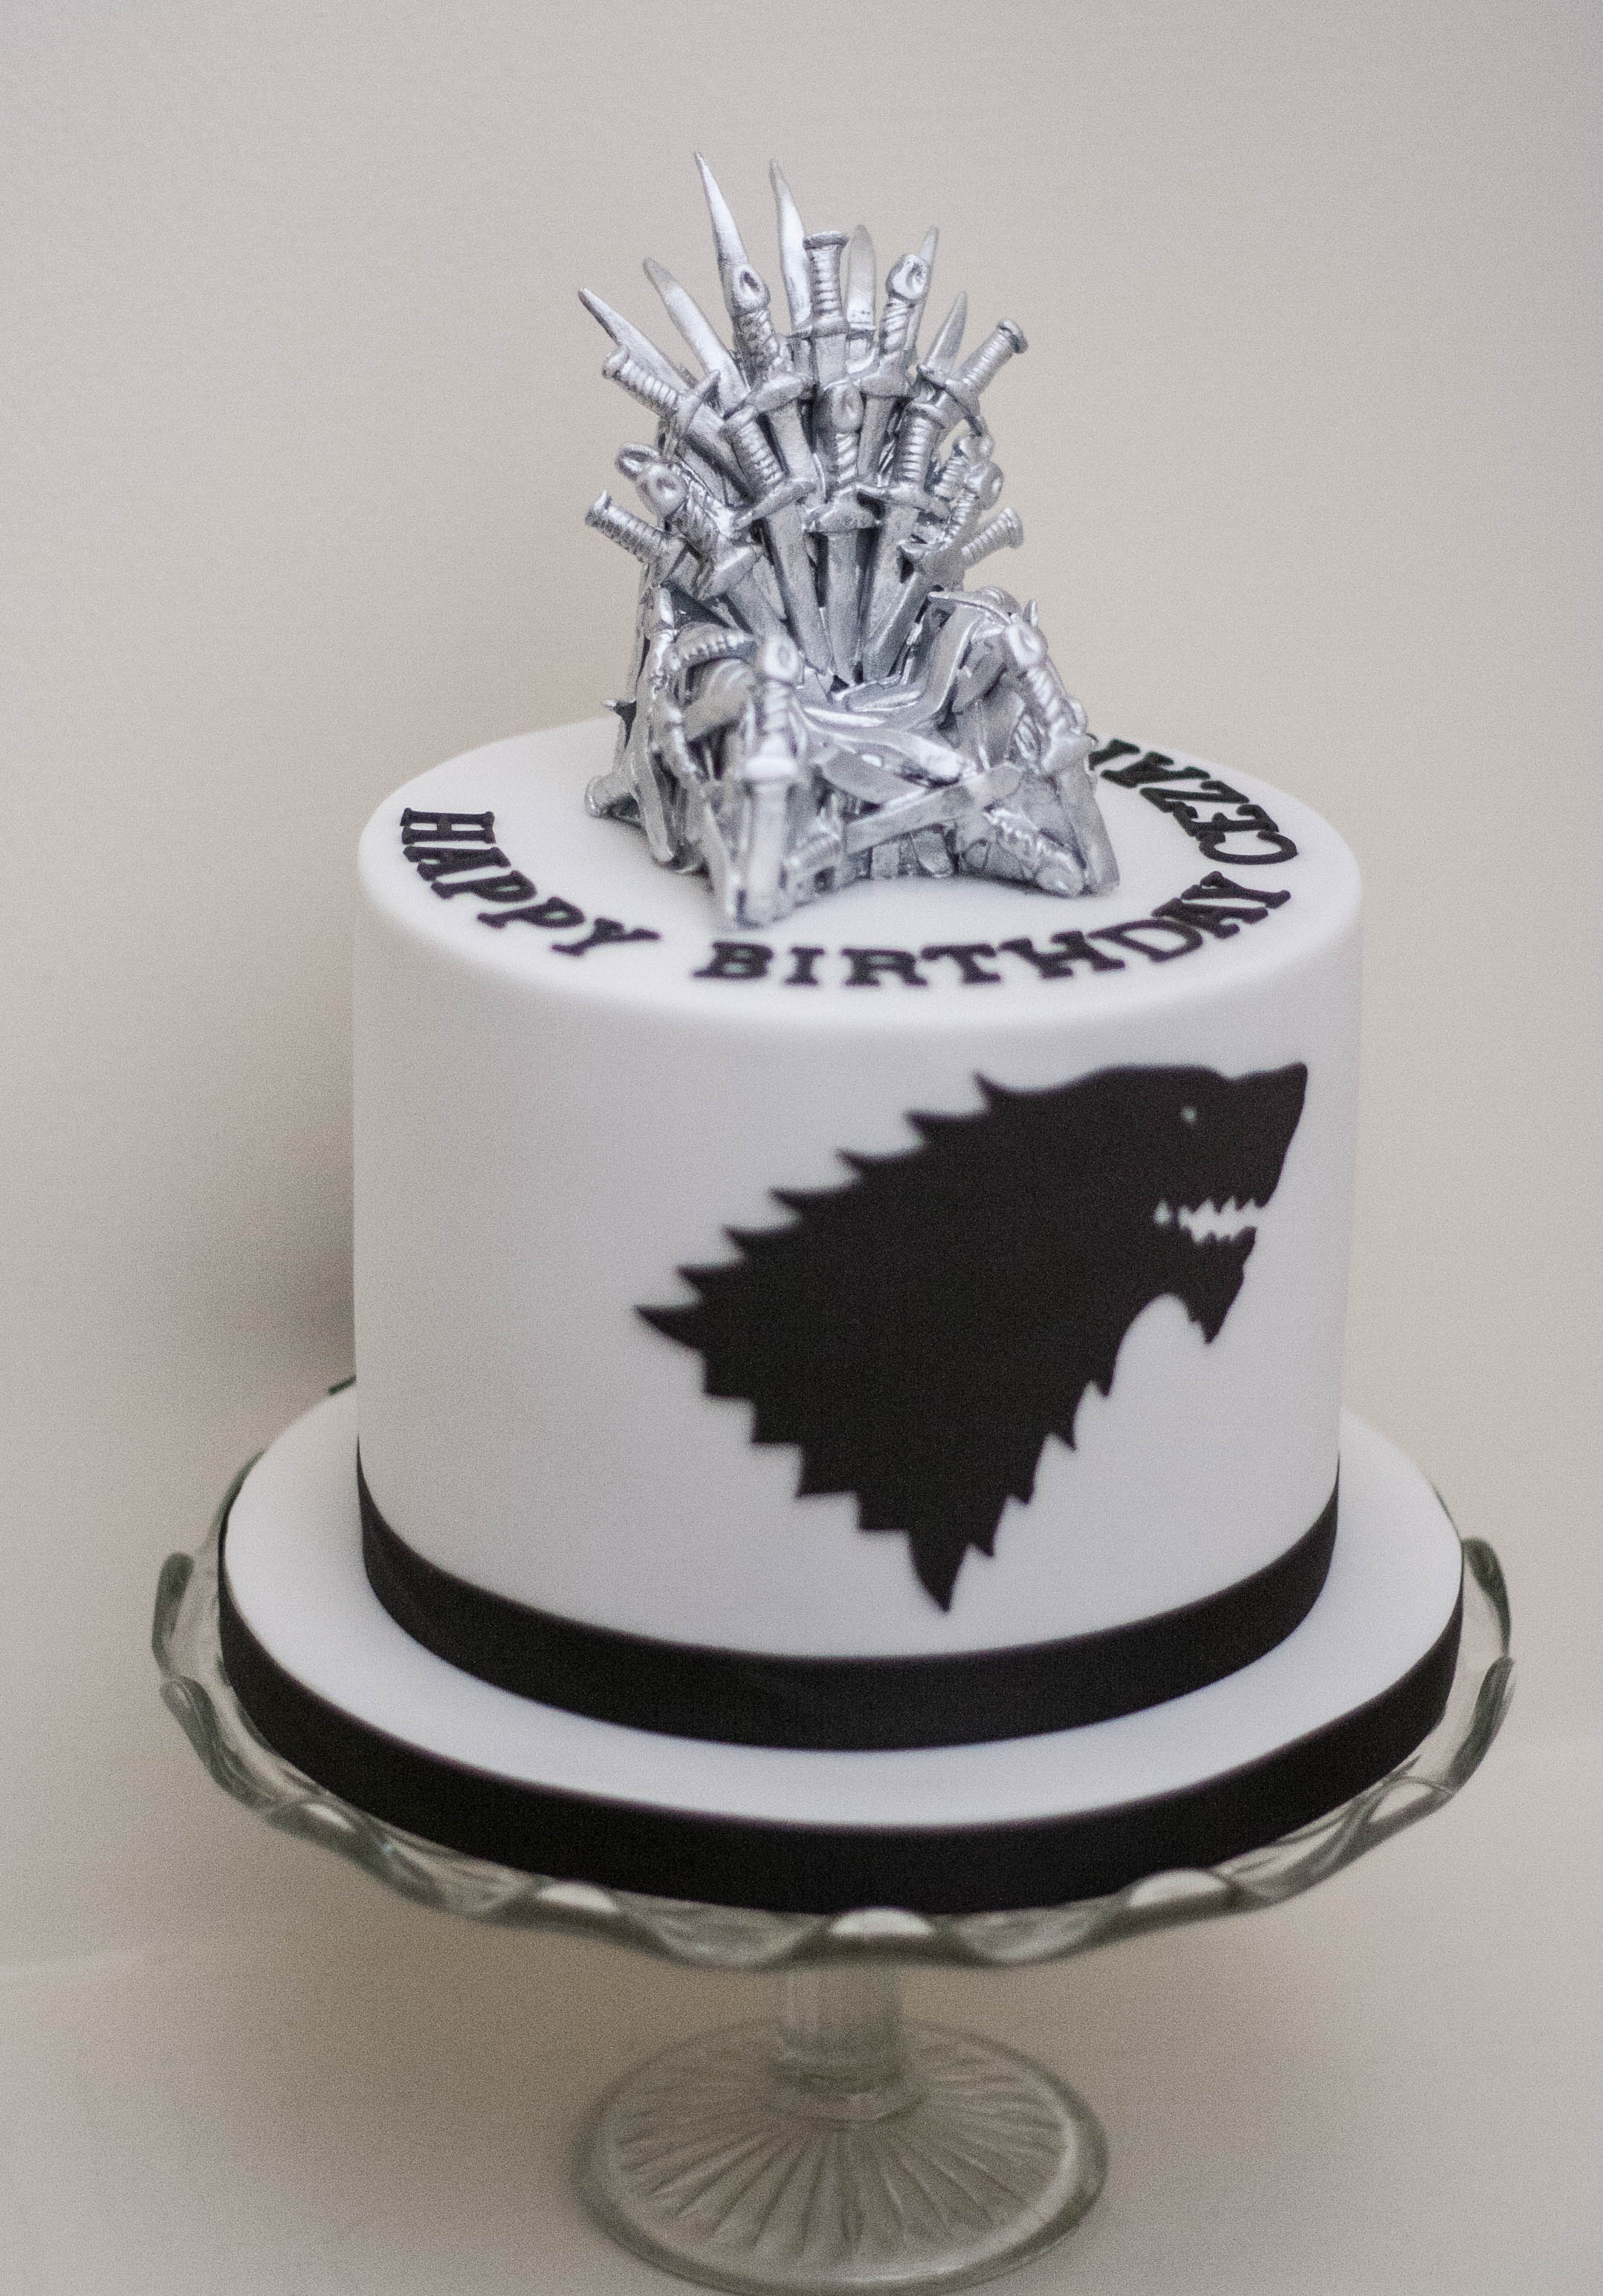 Game of Thrones cake vegan